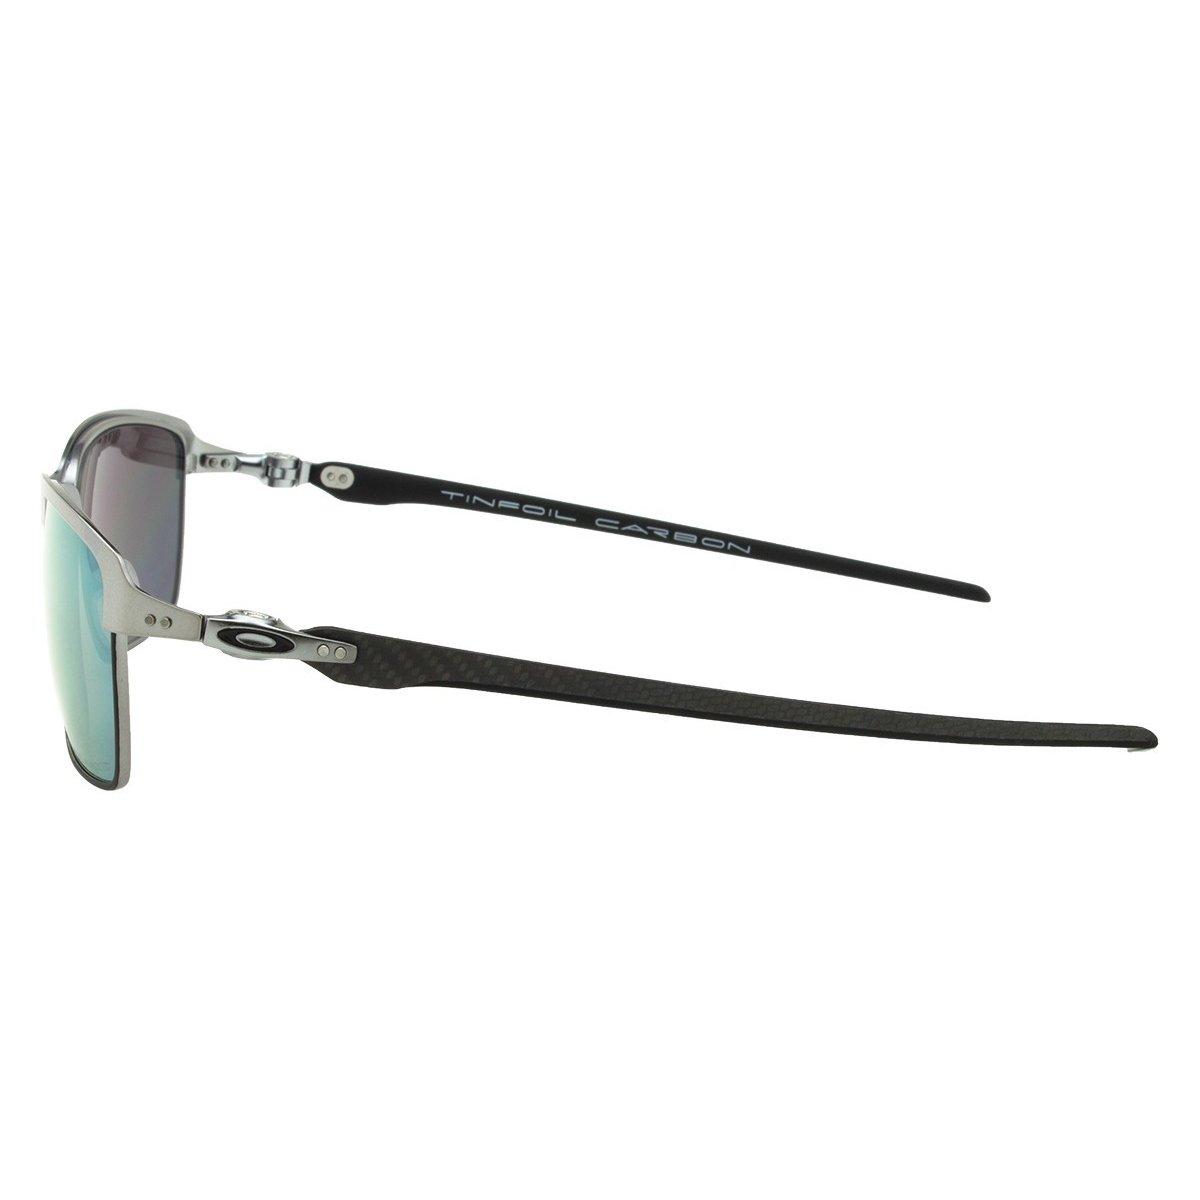 ... Óculos Oakley Tinfoil Carbon Lead Matte Black - Esmerald Iridium  Polarizado 70986237f5